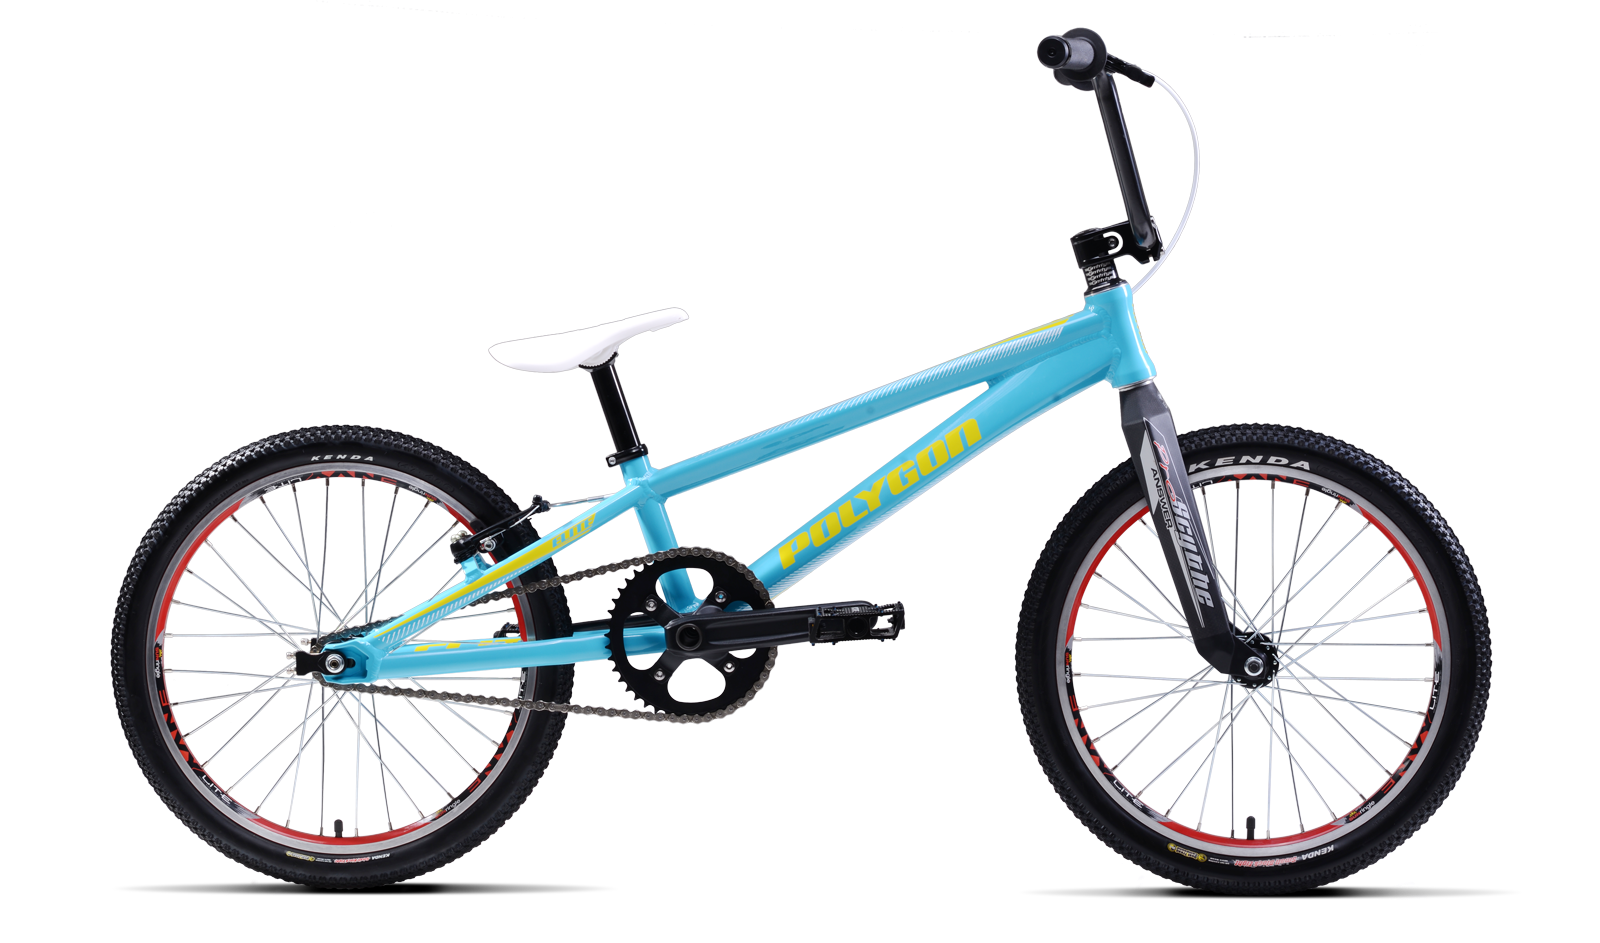 Spesifikasi Dan Harga Sepeda Razor BMX Race Polygon